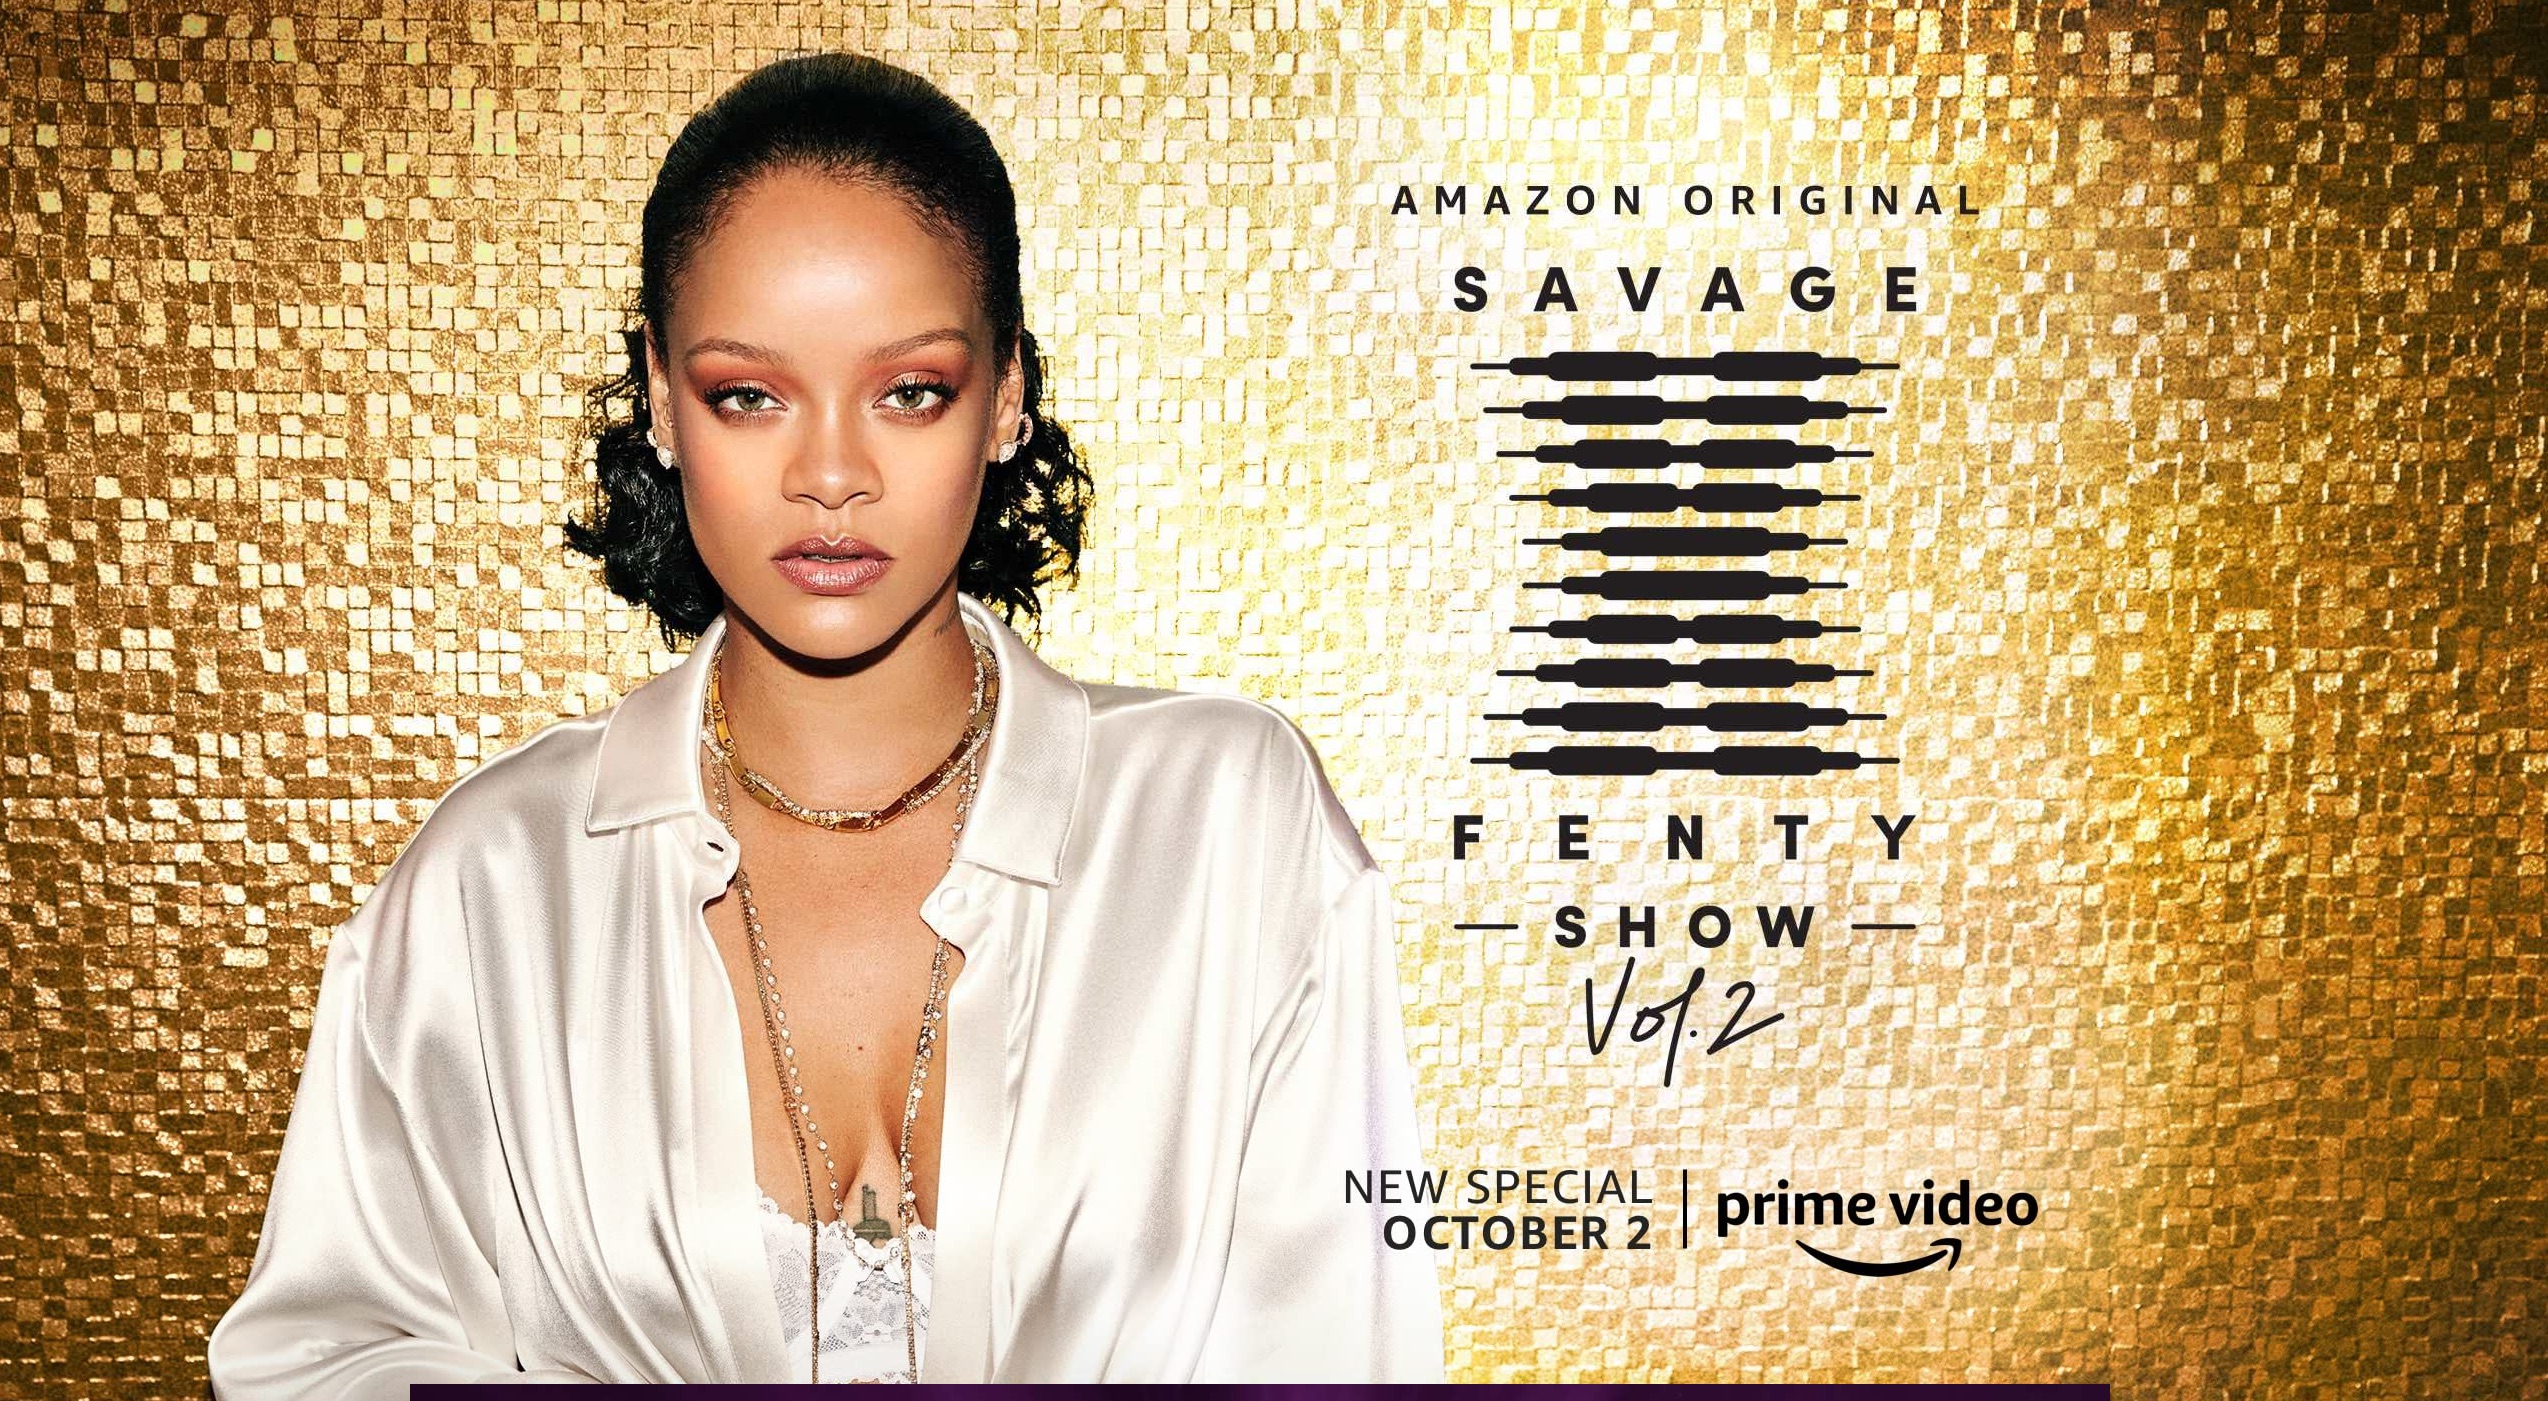 Savage Rihanna Fenty